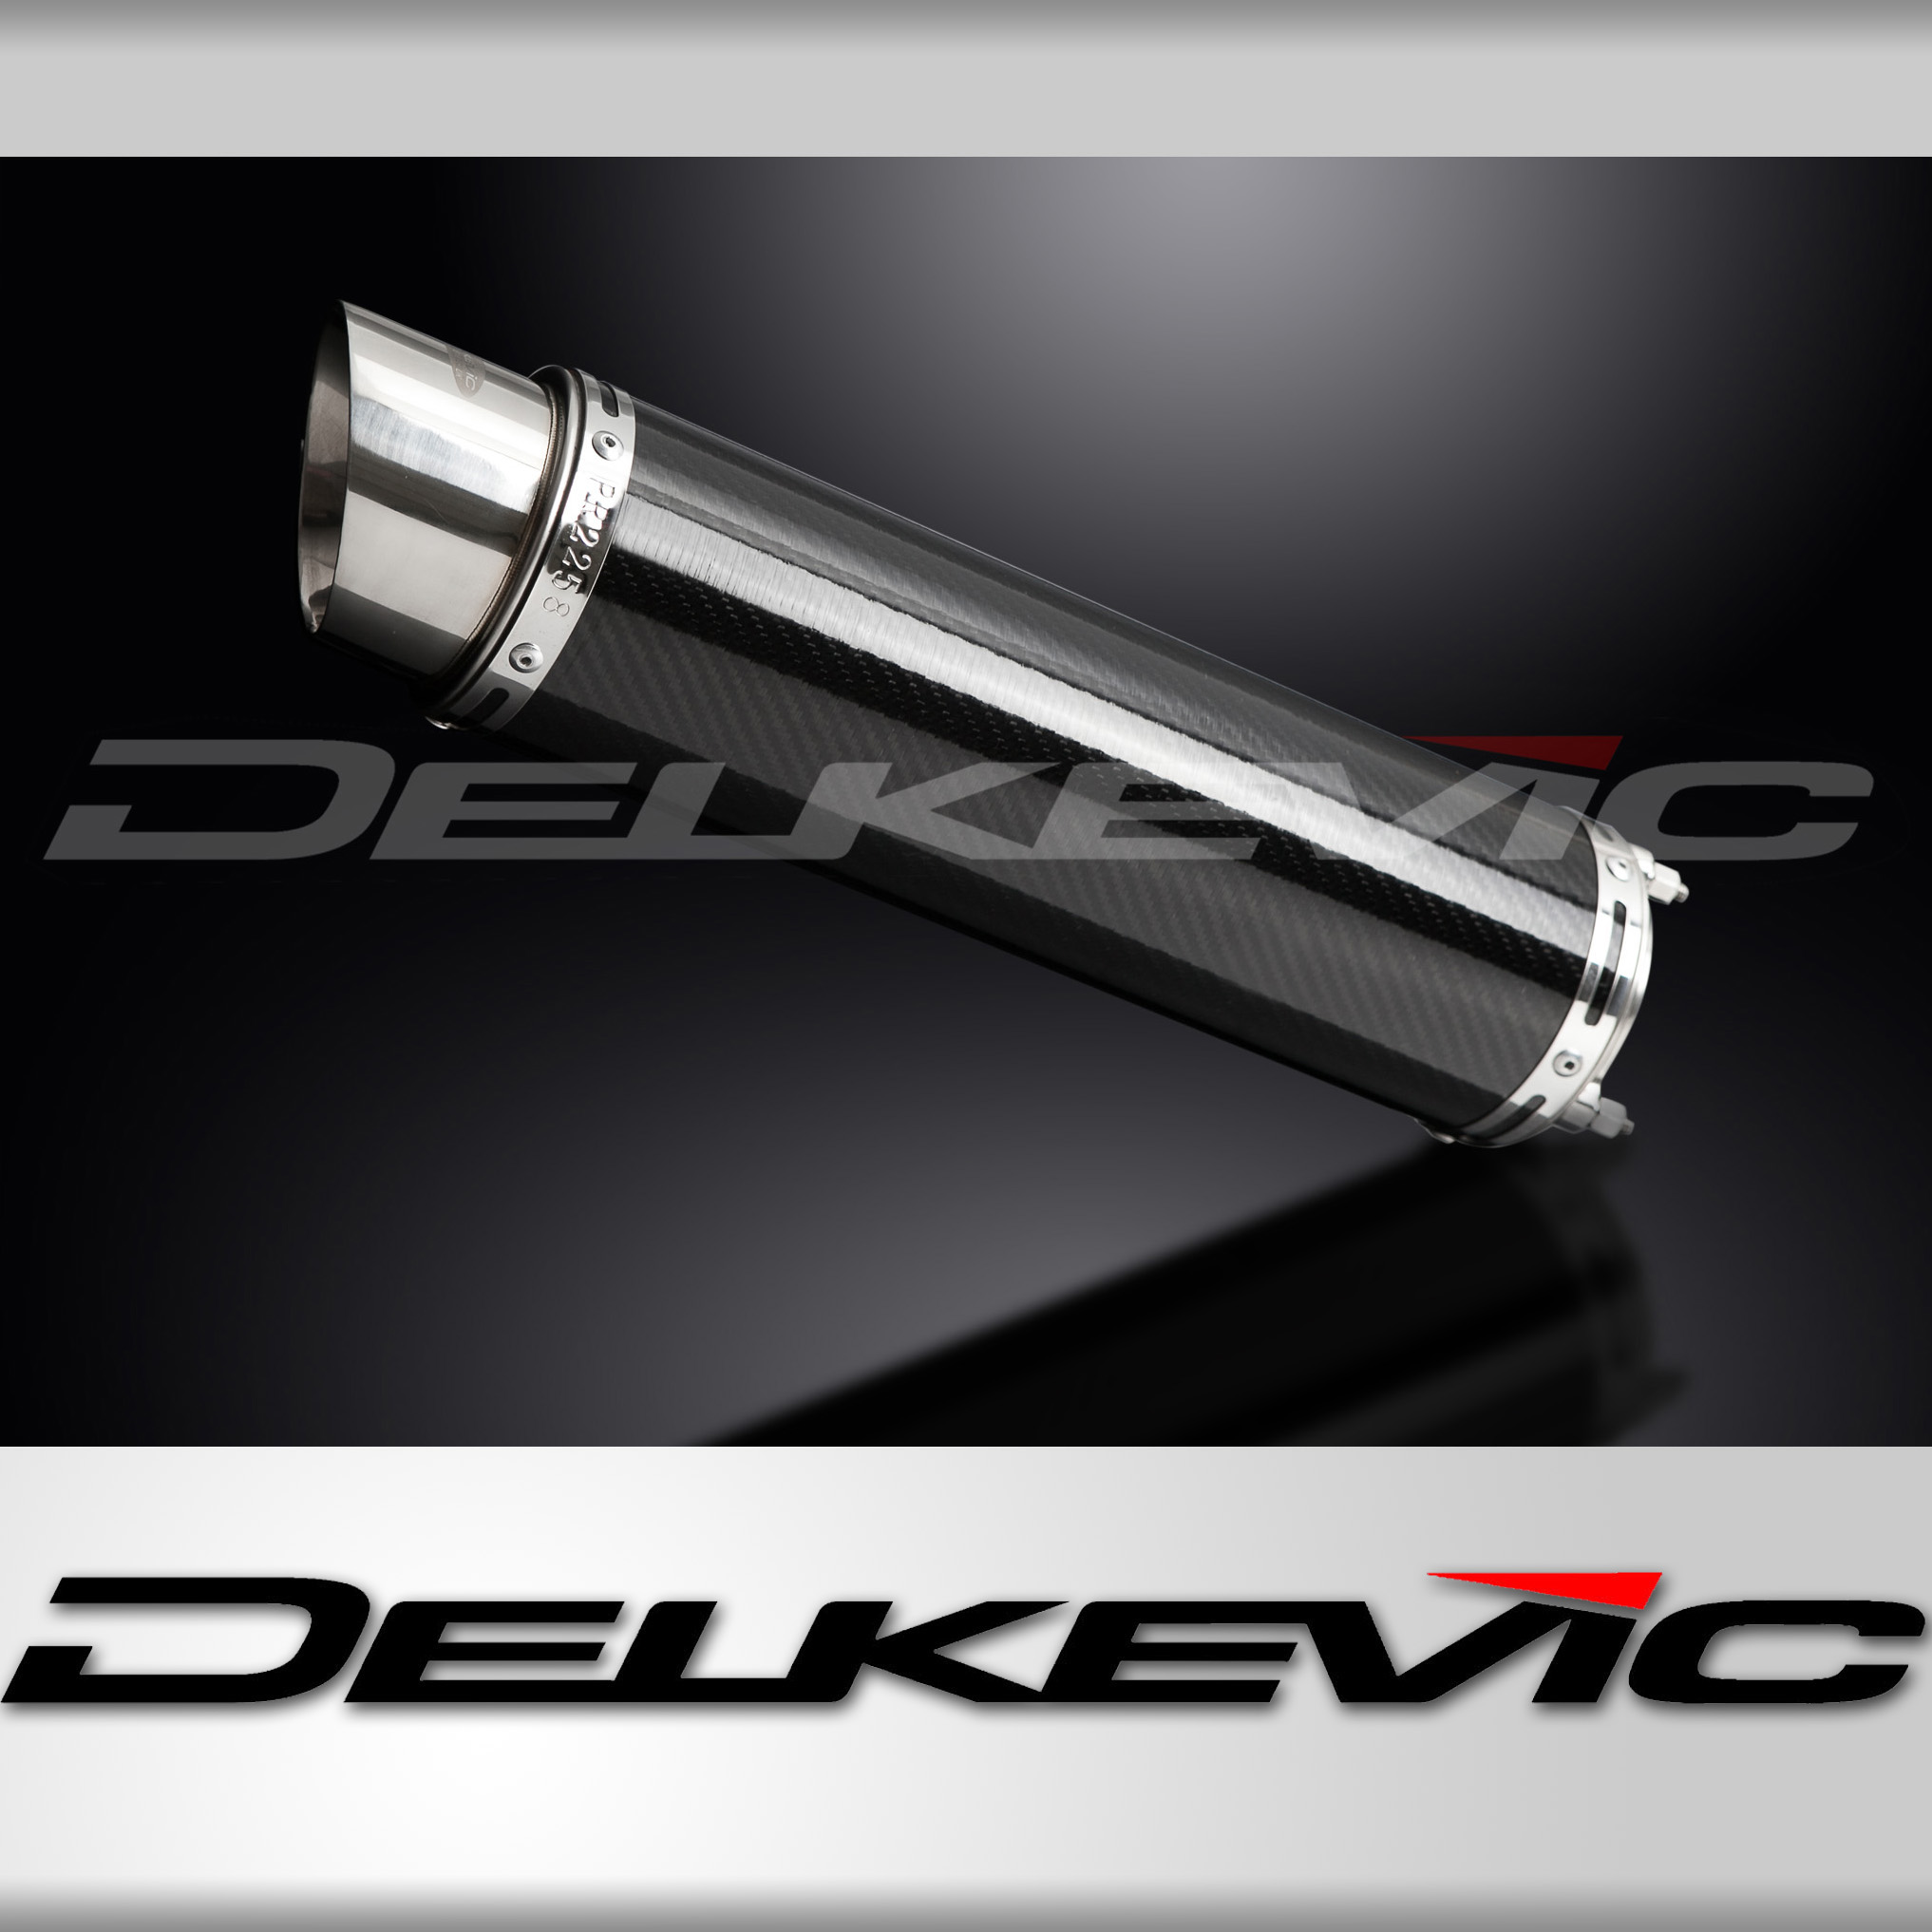 DELKEVIC EXHAUST BOLT-ON SILENCER 350mm CARBON FIBRE HONDA CB400SF NC39 92-98